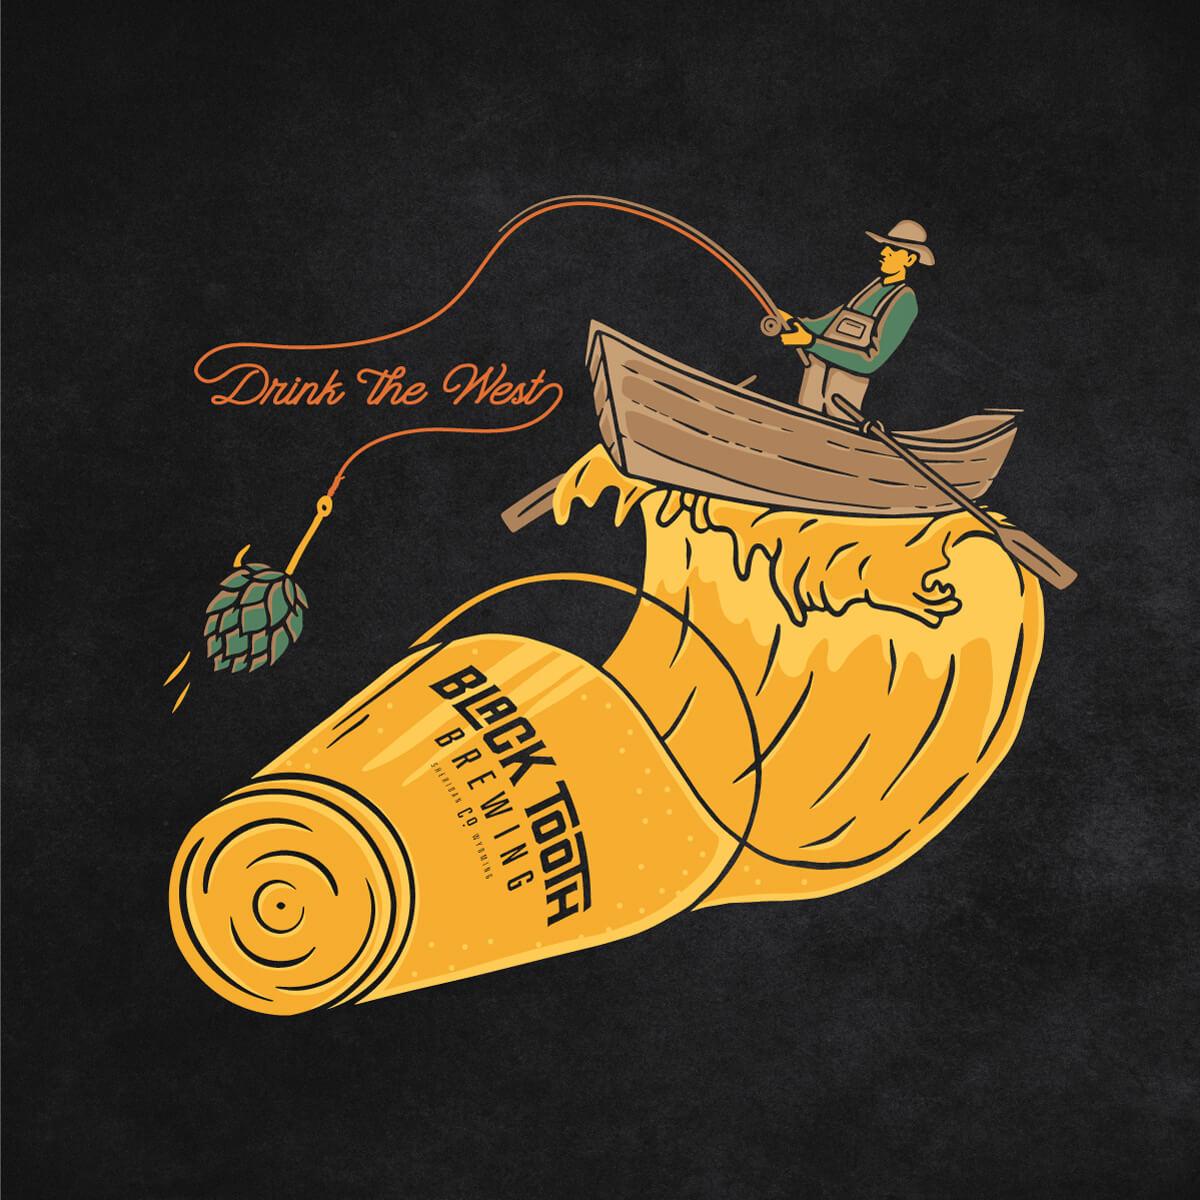 Blacktooth Brewing in Sheridan, Wyoming rafting, fly-fishing t-shirt design